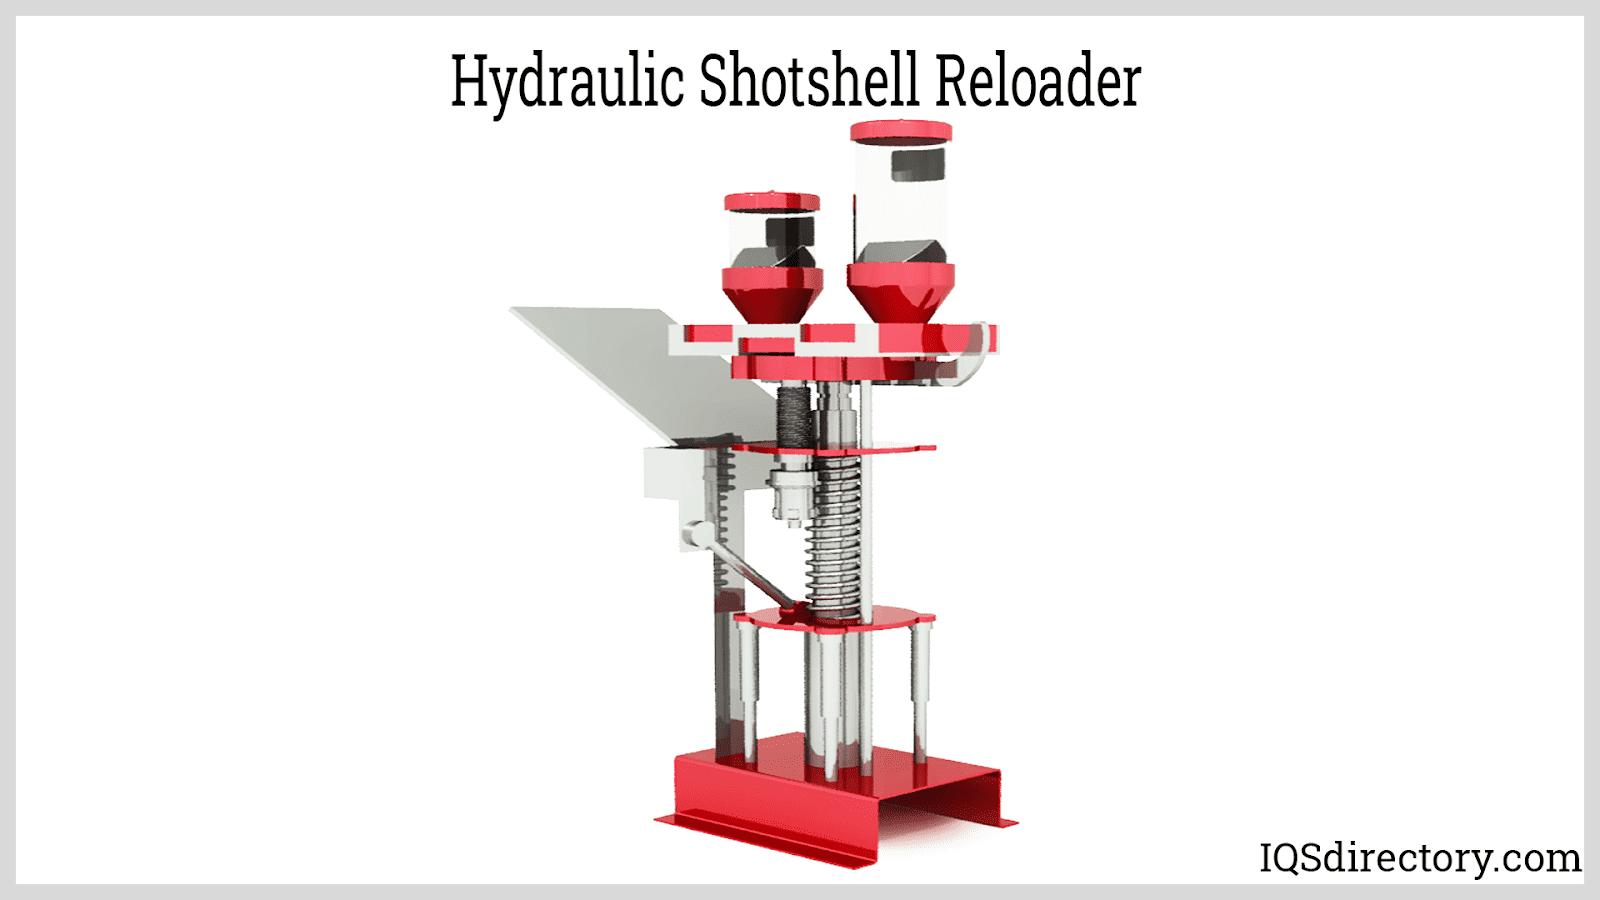 Hydraulic Shotshell Reloader